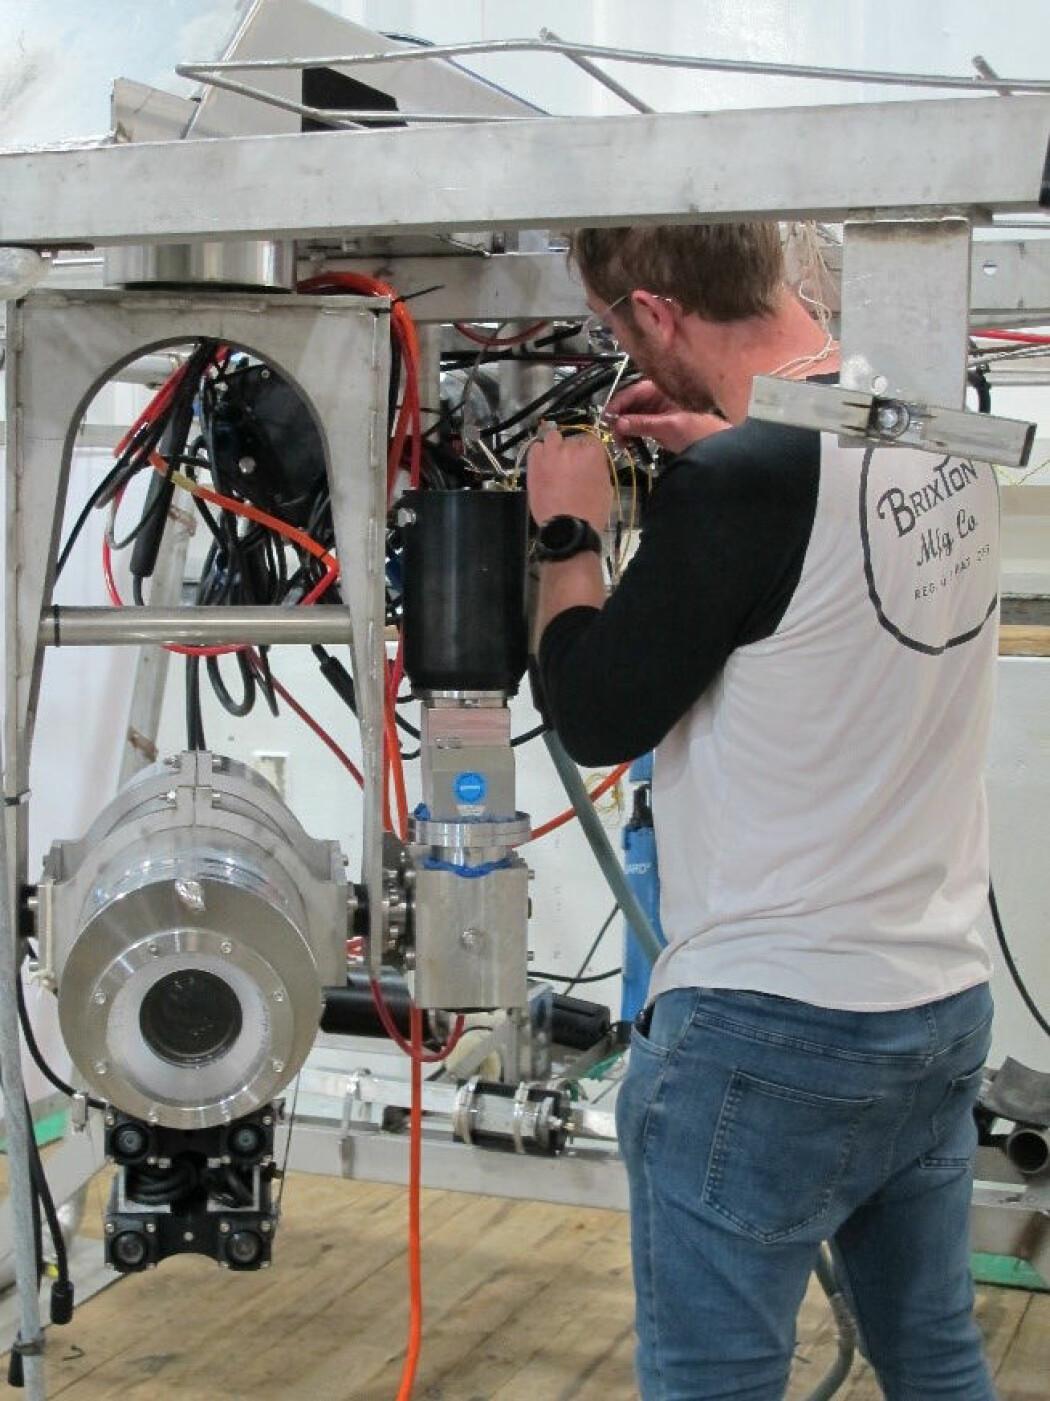 "Videoriggen ""Chimaera"" klargjøres, her ved instrumentingeniør Sindre Nygård Larsen. Nede til venstre ses riggens hovedkamera, bygd inn i en titankapsel som tåler flere tusen meters dyp. Foto: B. Holte"